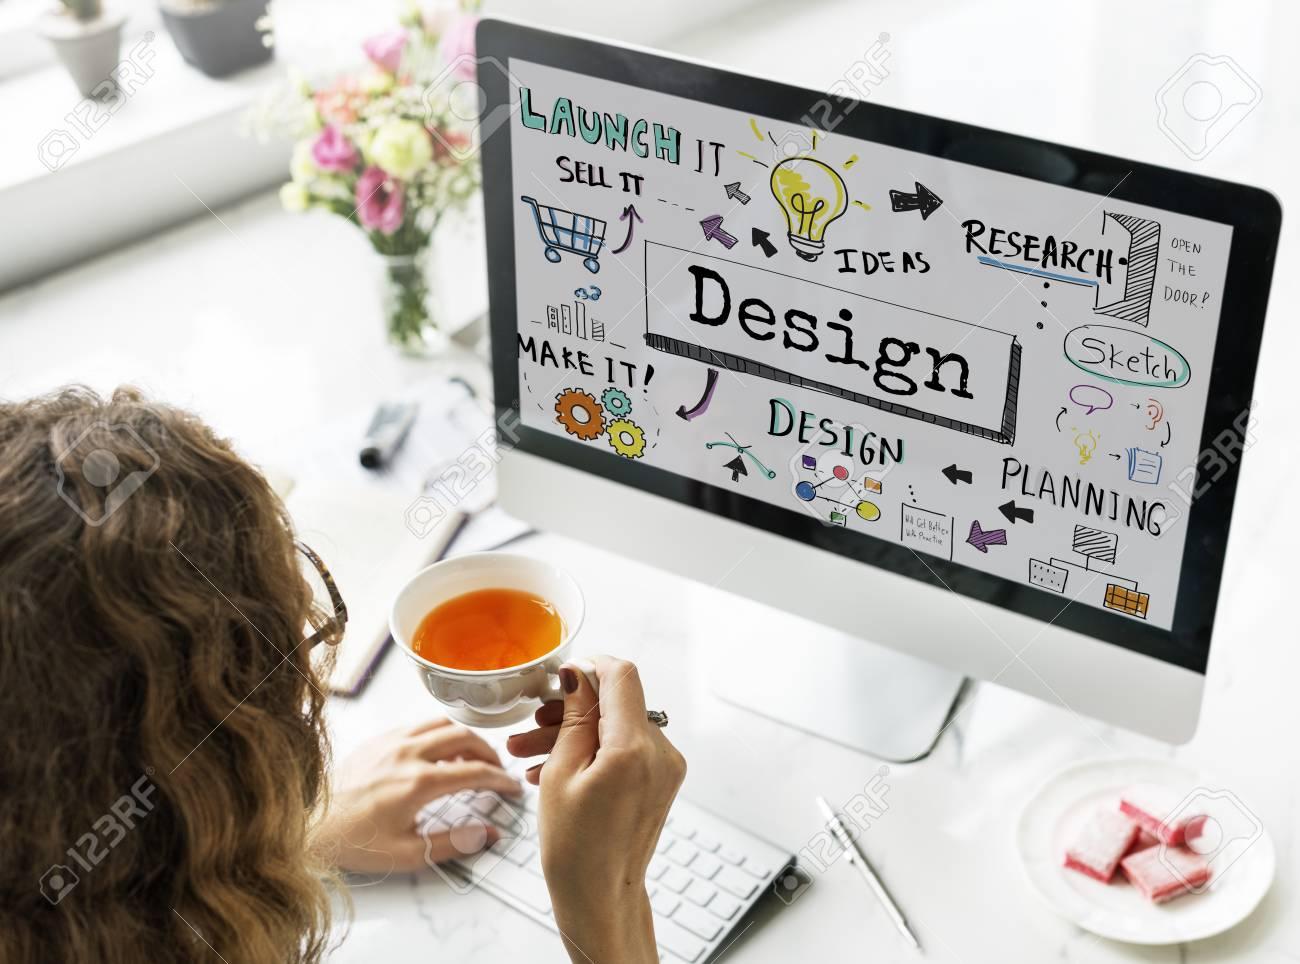 Design Creative Ideas Objective Planning Sketch Concept Stock Photo - 66531783